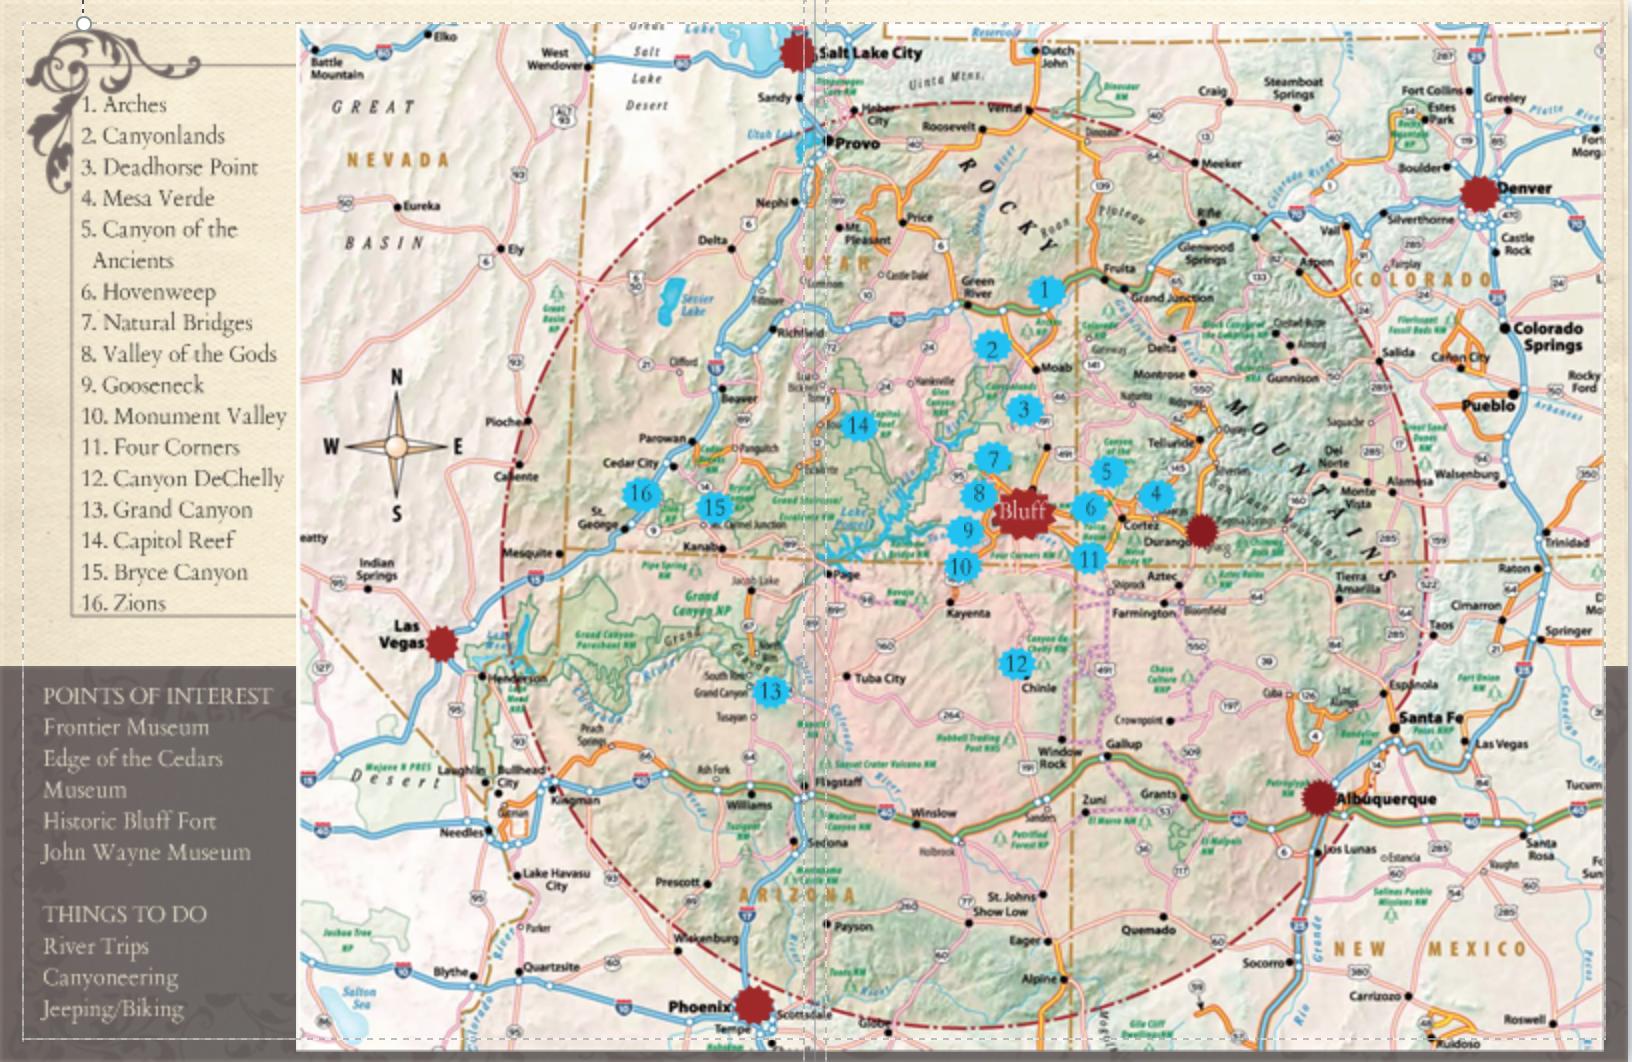 ROAD TRIP TO FOUR CORNER Day 1 Denver to Glenwood Springs